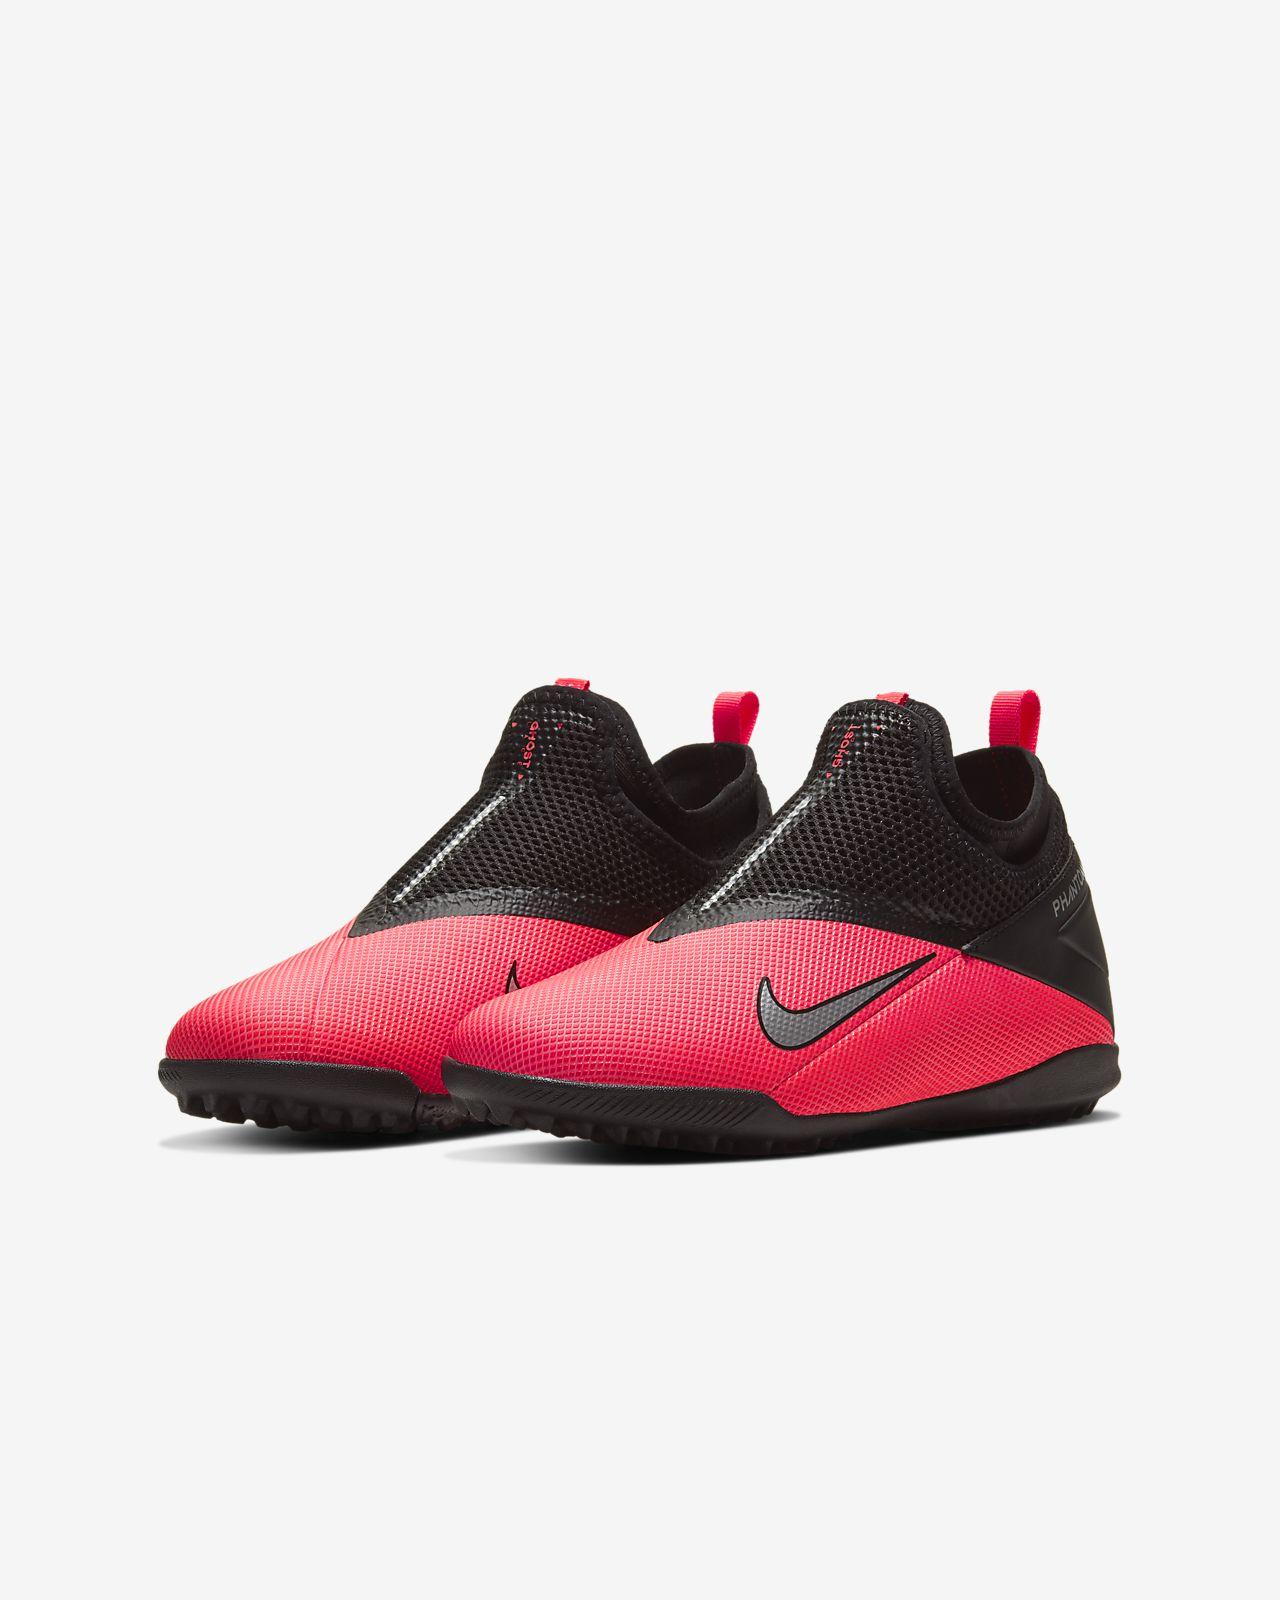 Scarpa da calcio per erba artificialesintetica Nike Jr. Phantom Vision 2 Academy Dynamic Fit TF BambiniRagazzi